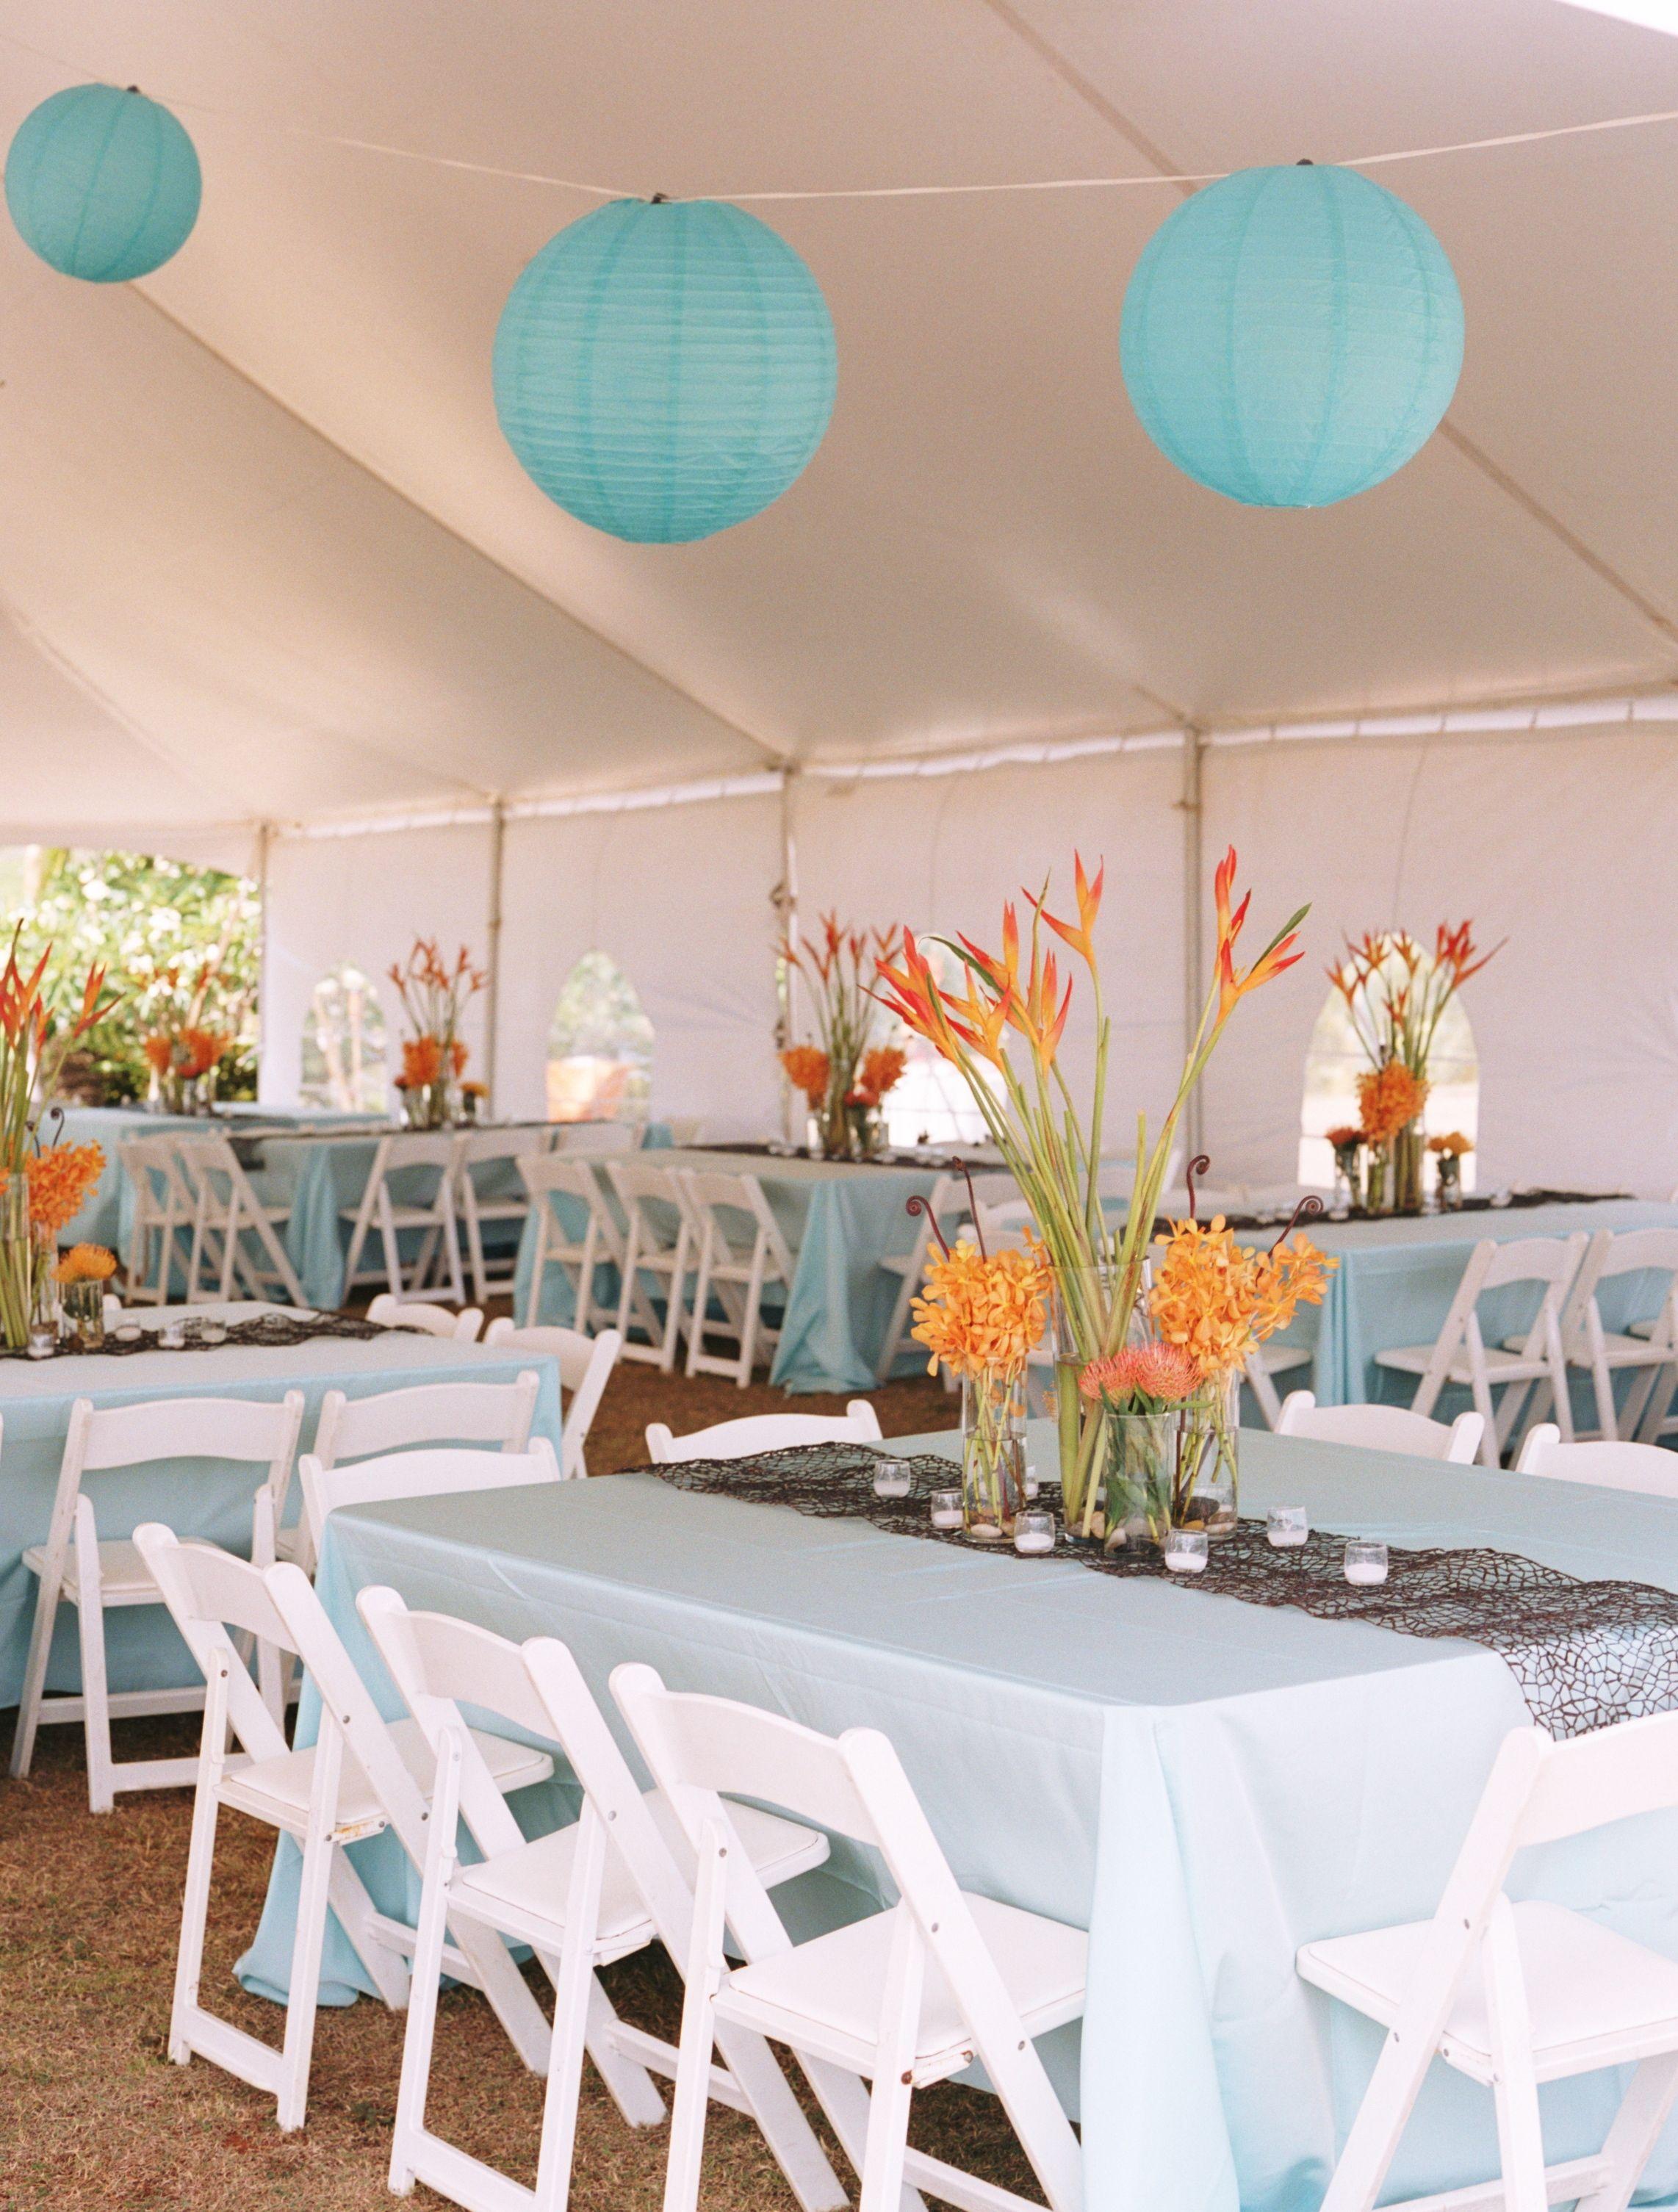 Blue wedding decor ideas  The tented receptionus palette of crisp white turquoise and orange